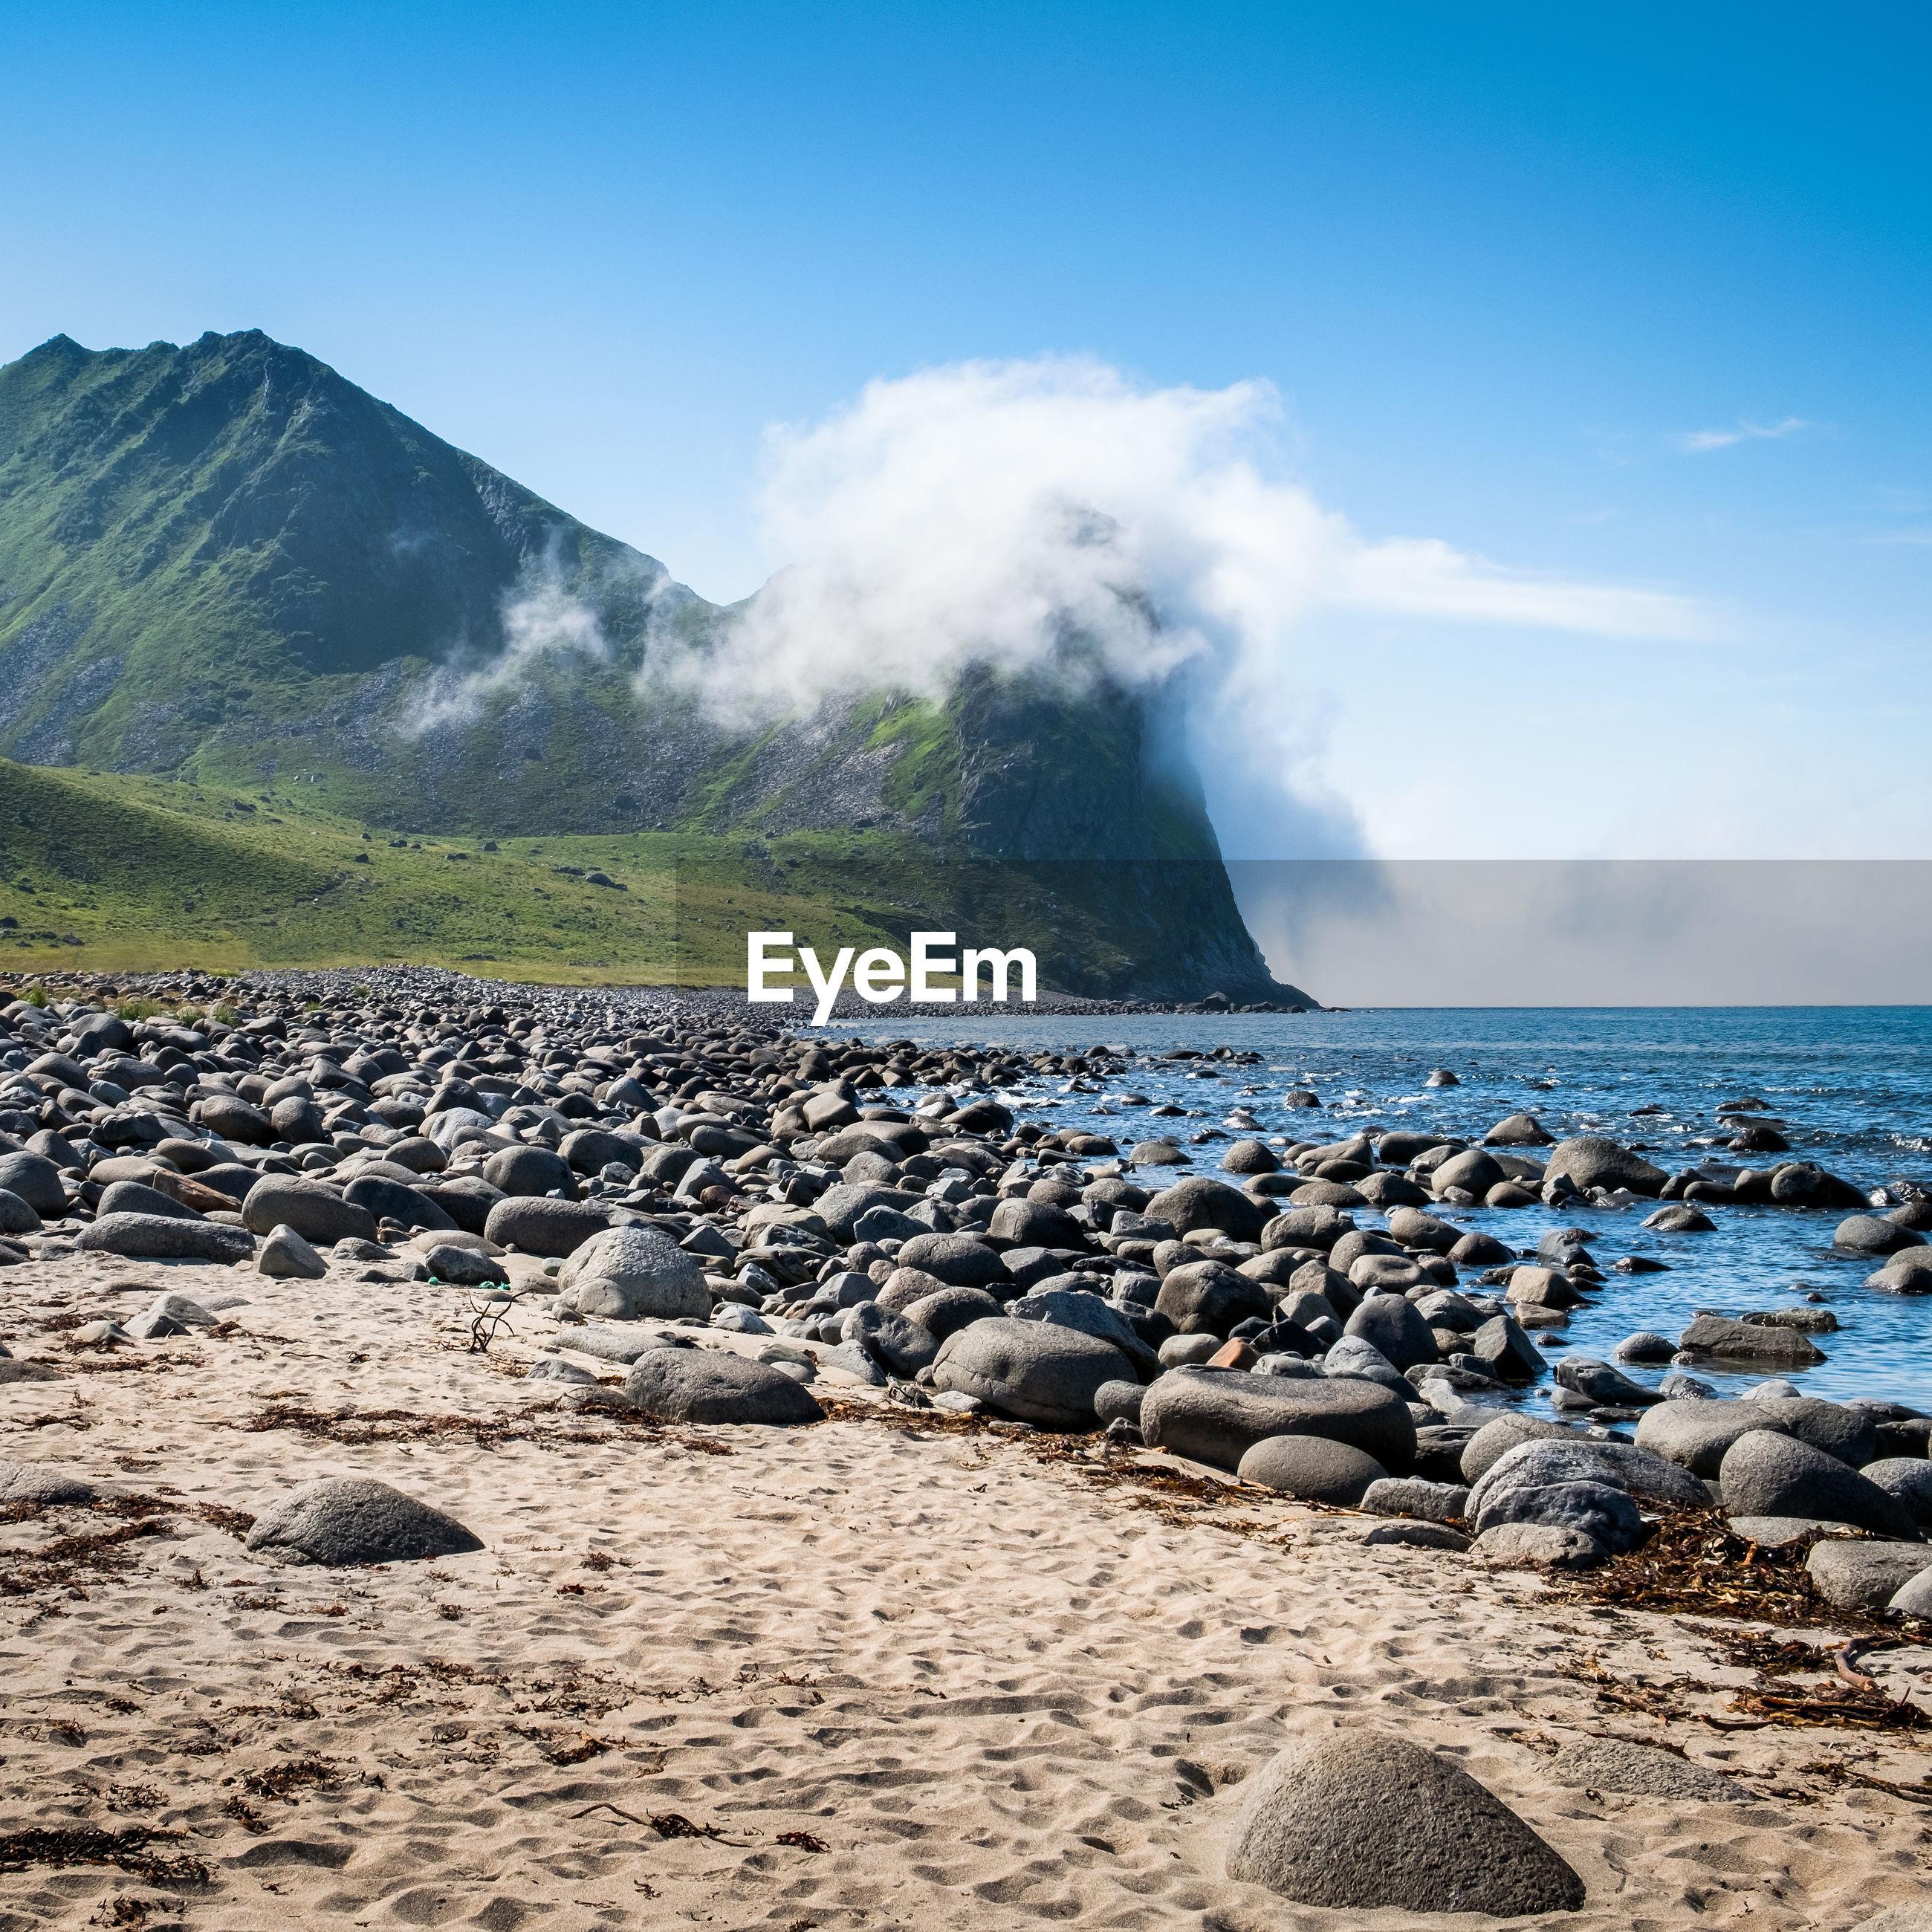 ROCKS AT SEA SHORE AGAINST SKY